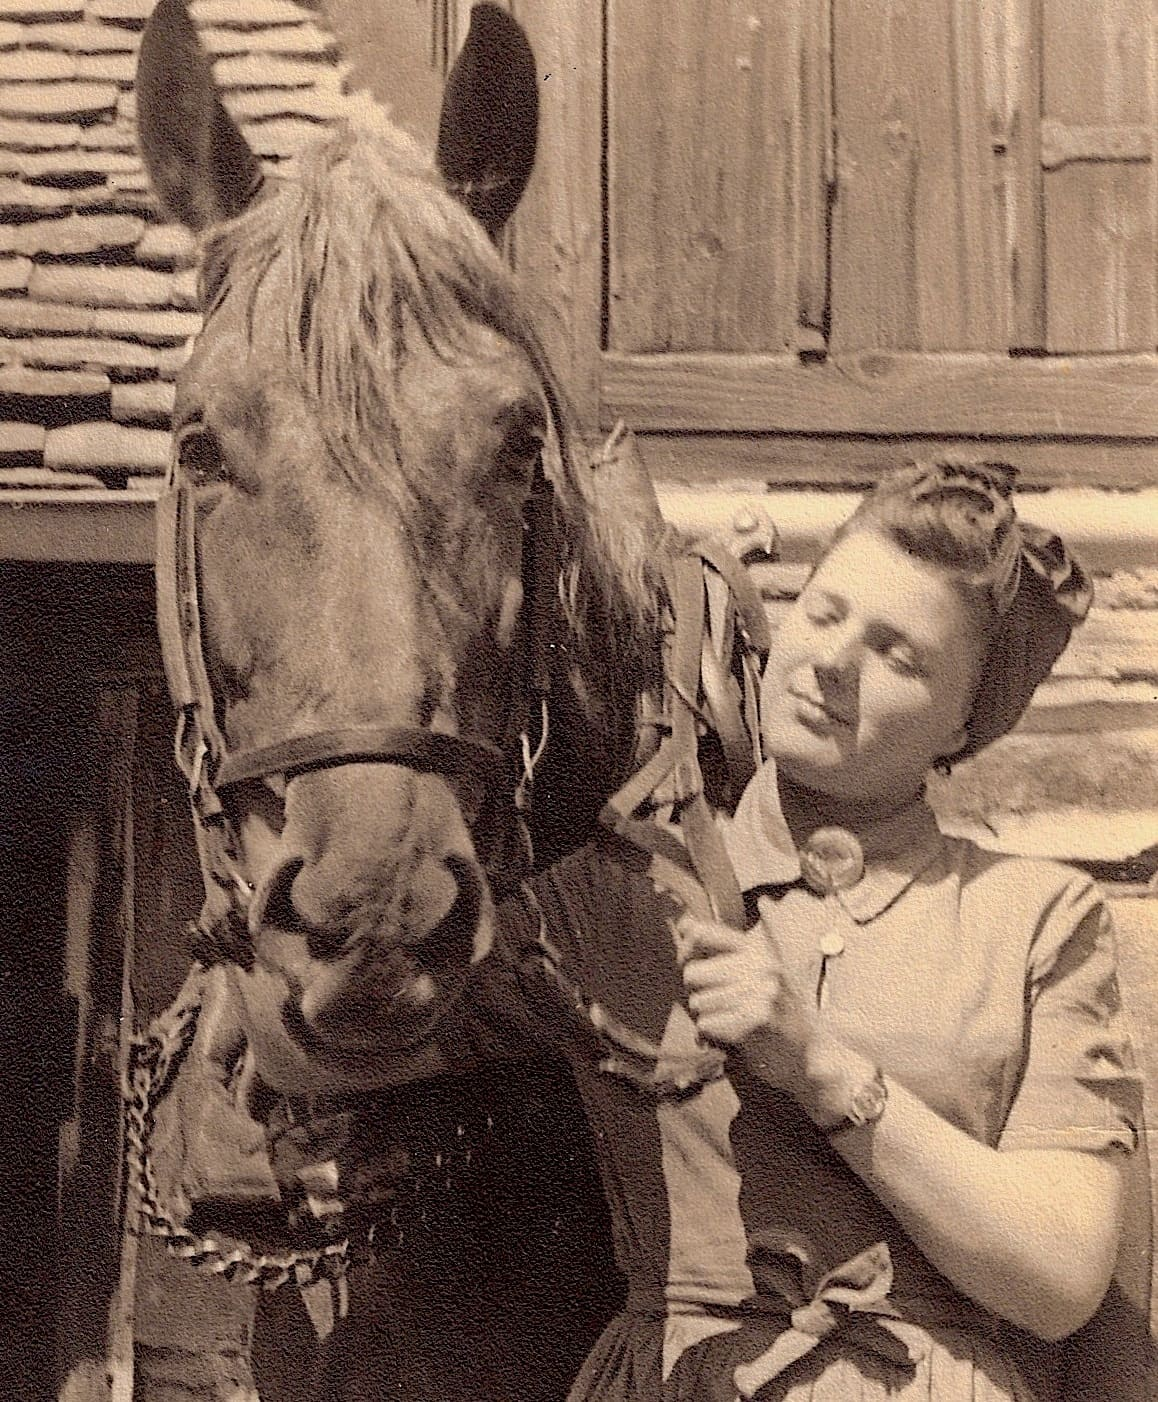 Gisela Wiegandt - 1941